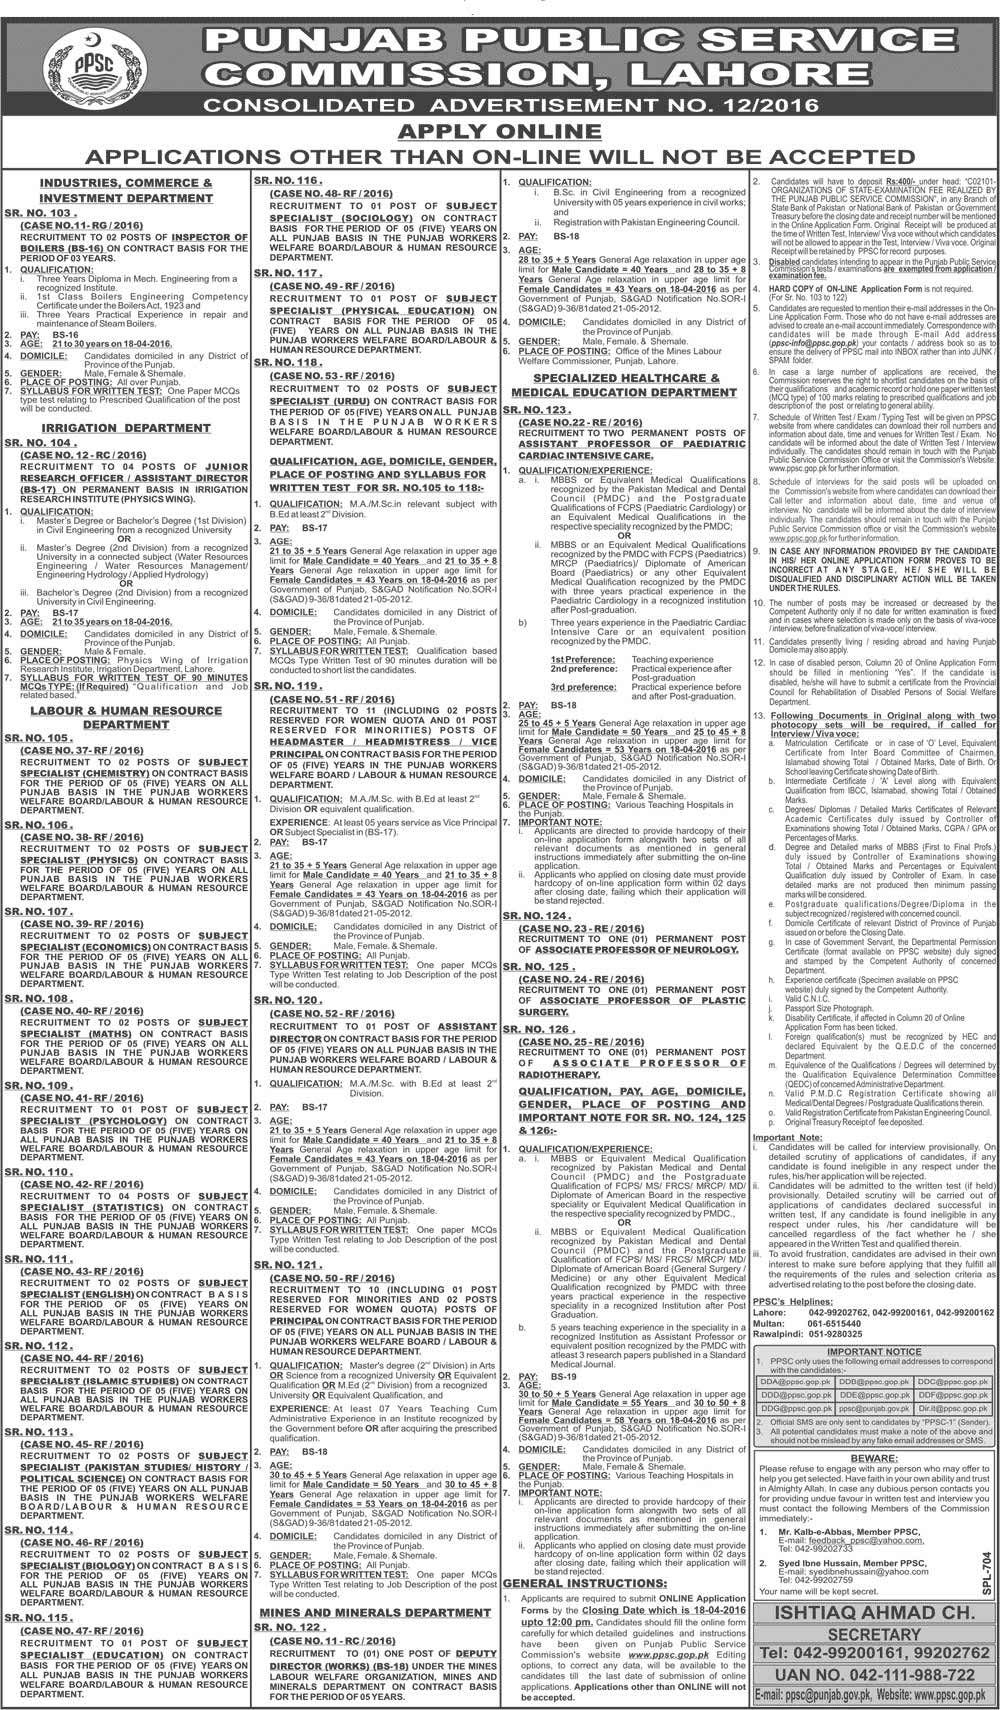 Punajb Public Service Commission Adv 12-2016